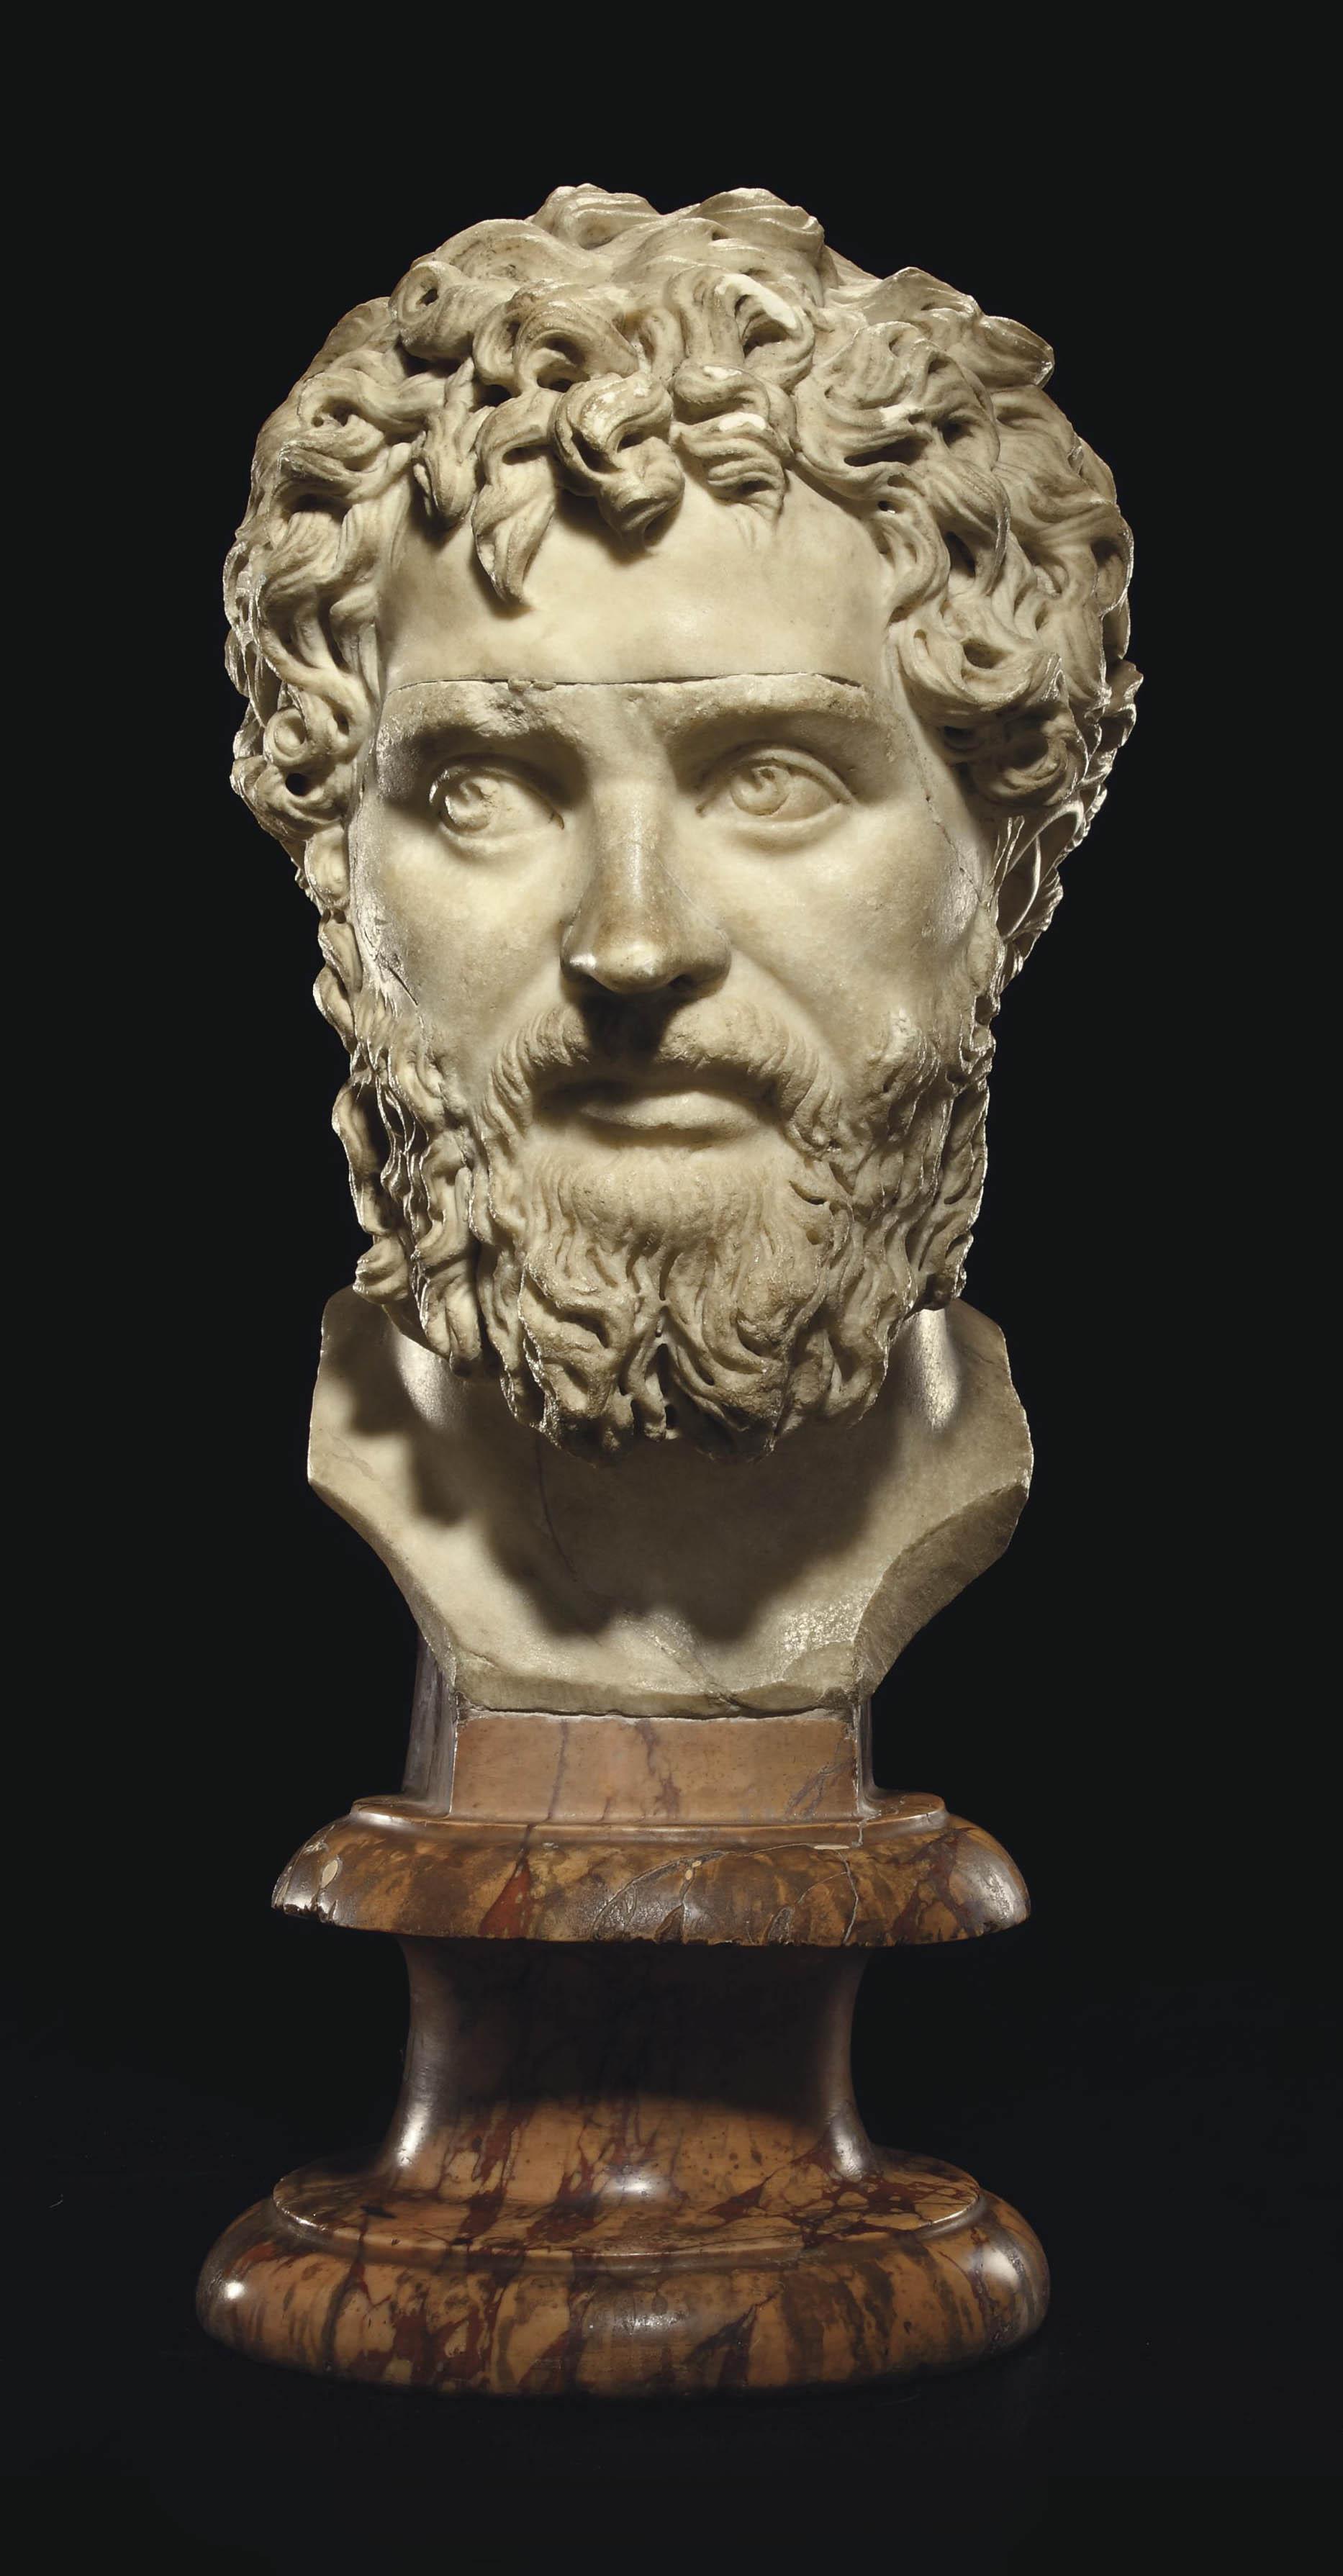 A ROMAN MARBLE PORTRAIT BUST OF THE EMPEROR SEPTIMIUS SEVERUS